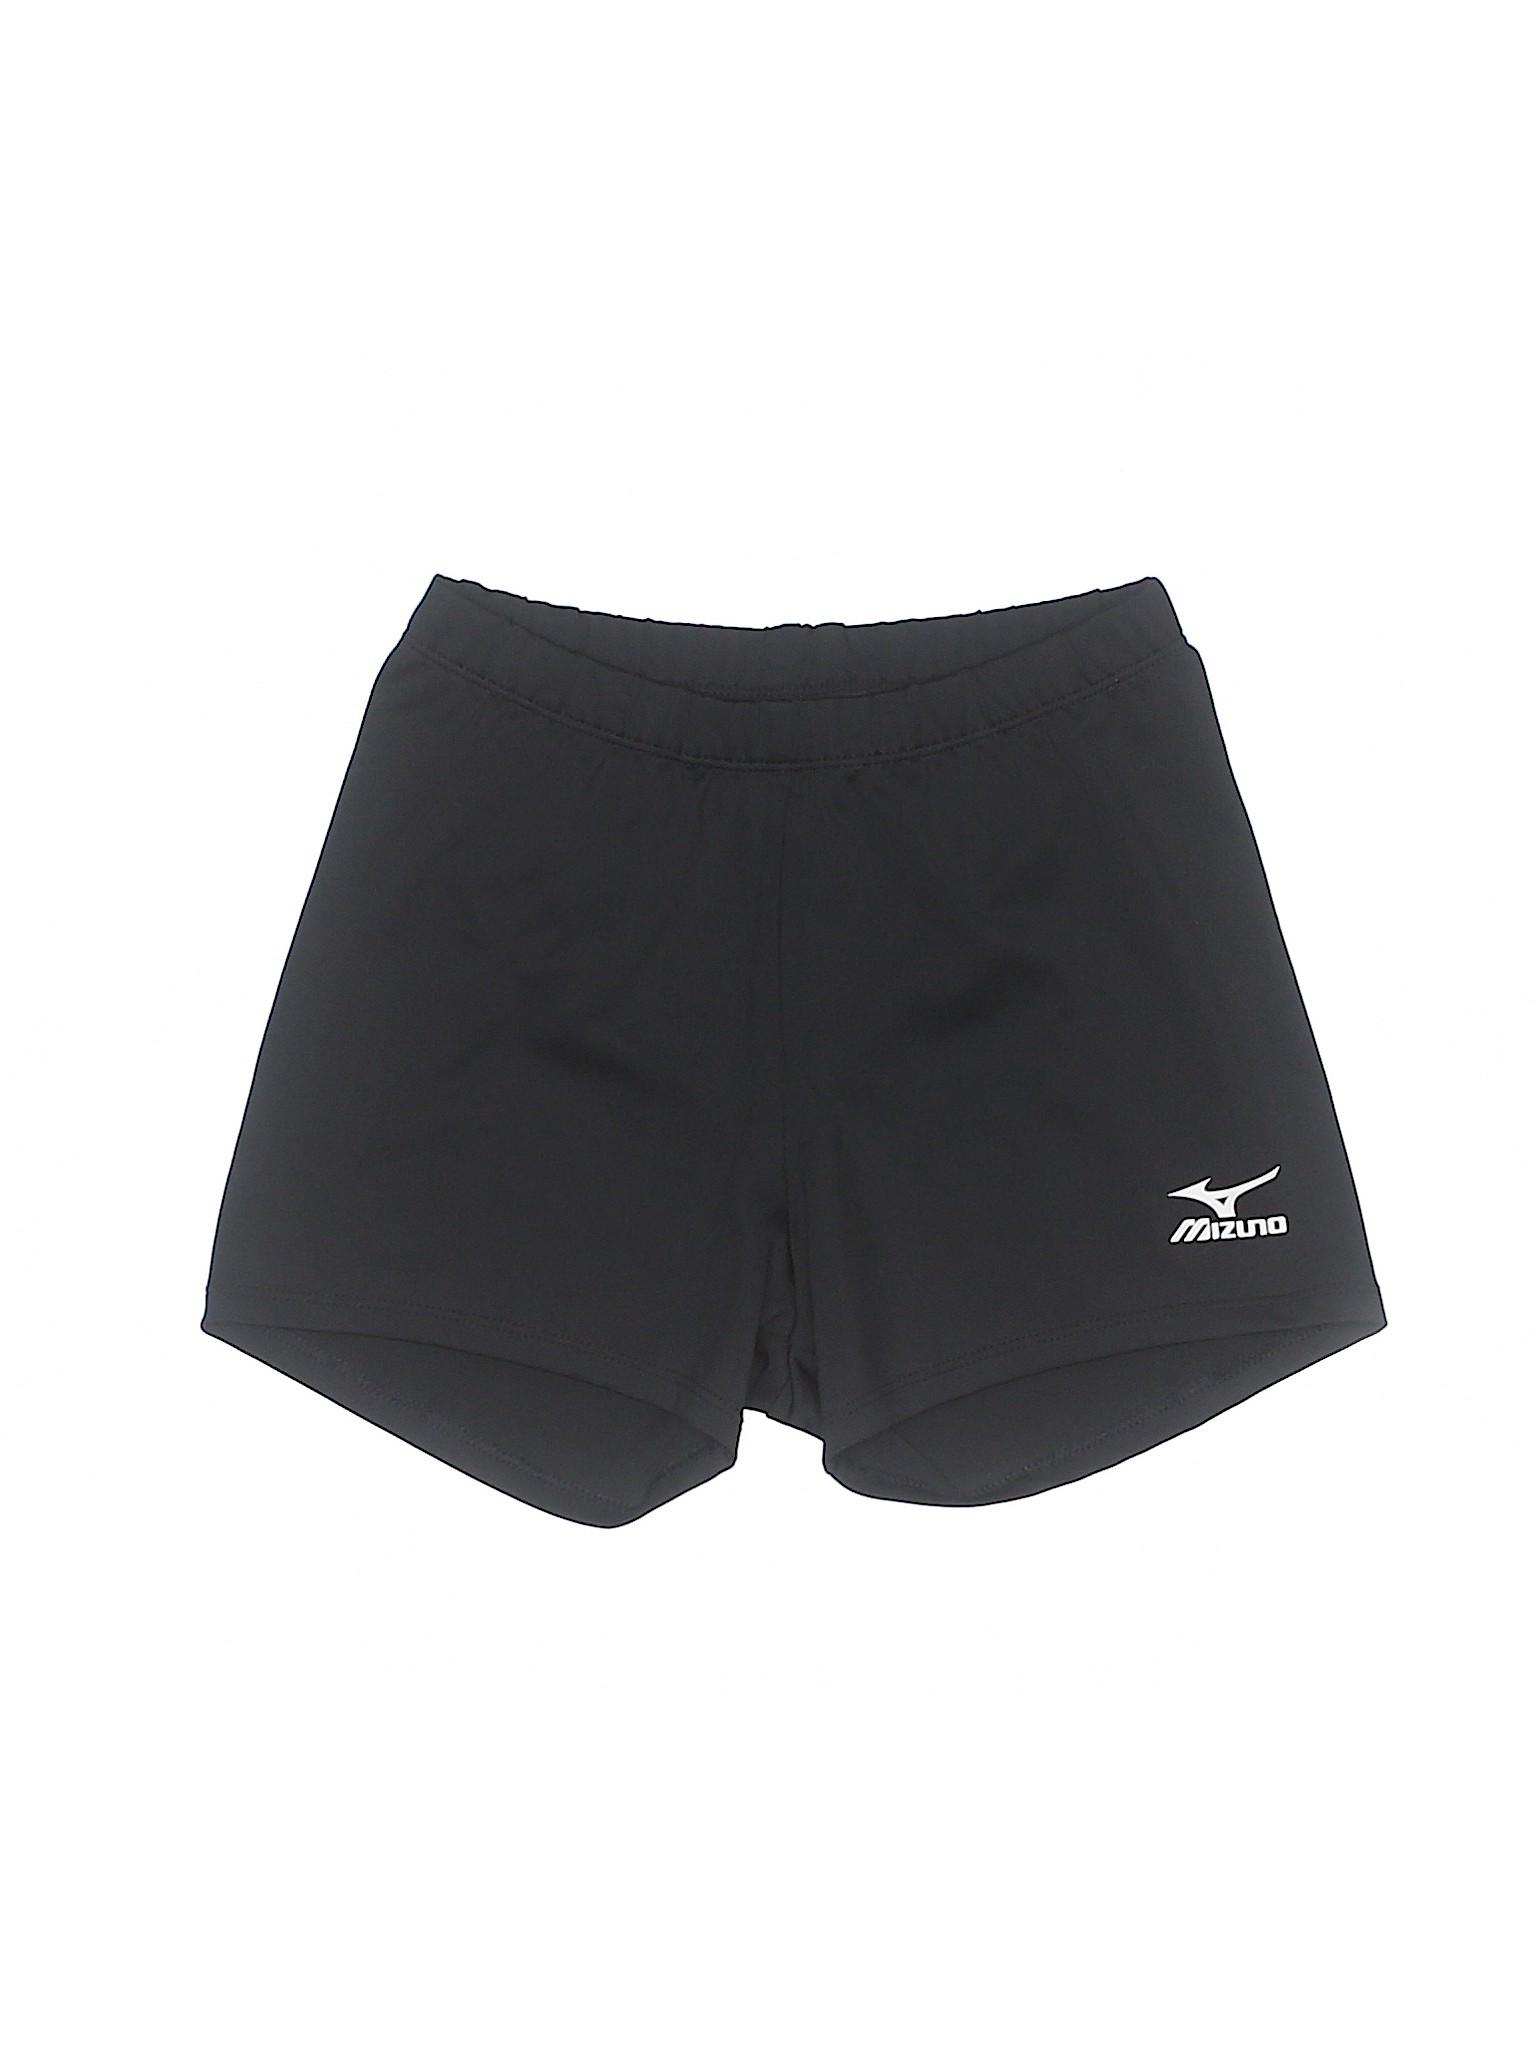 Athletic Boutique Mizuno Shorts Mizuno Athletic Boutique Shorts wgRgvBqP